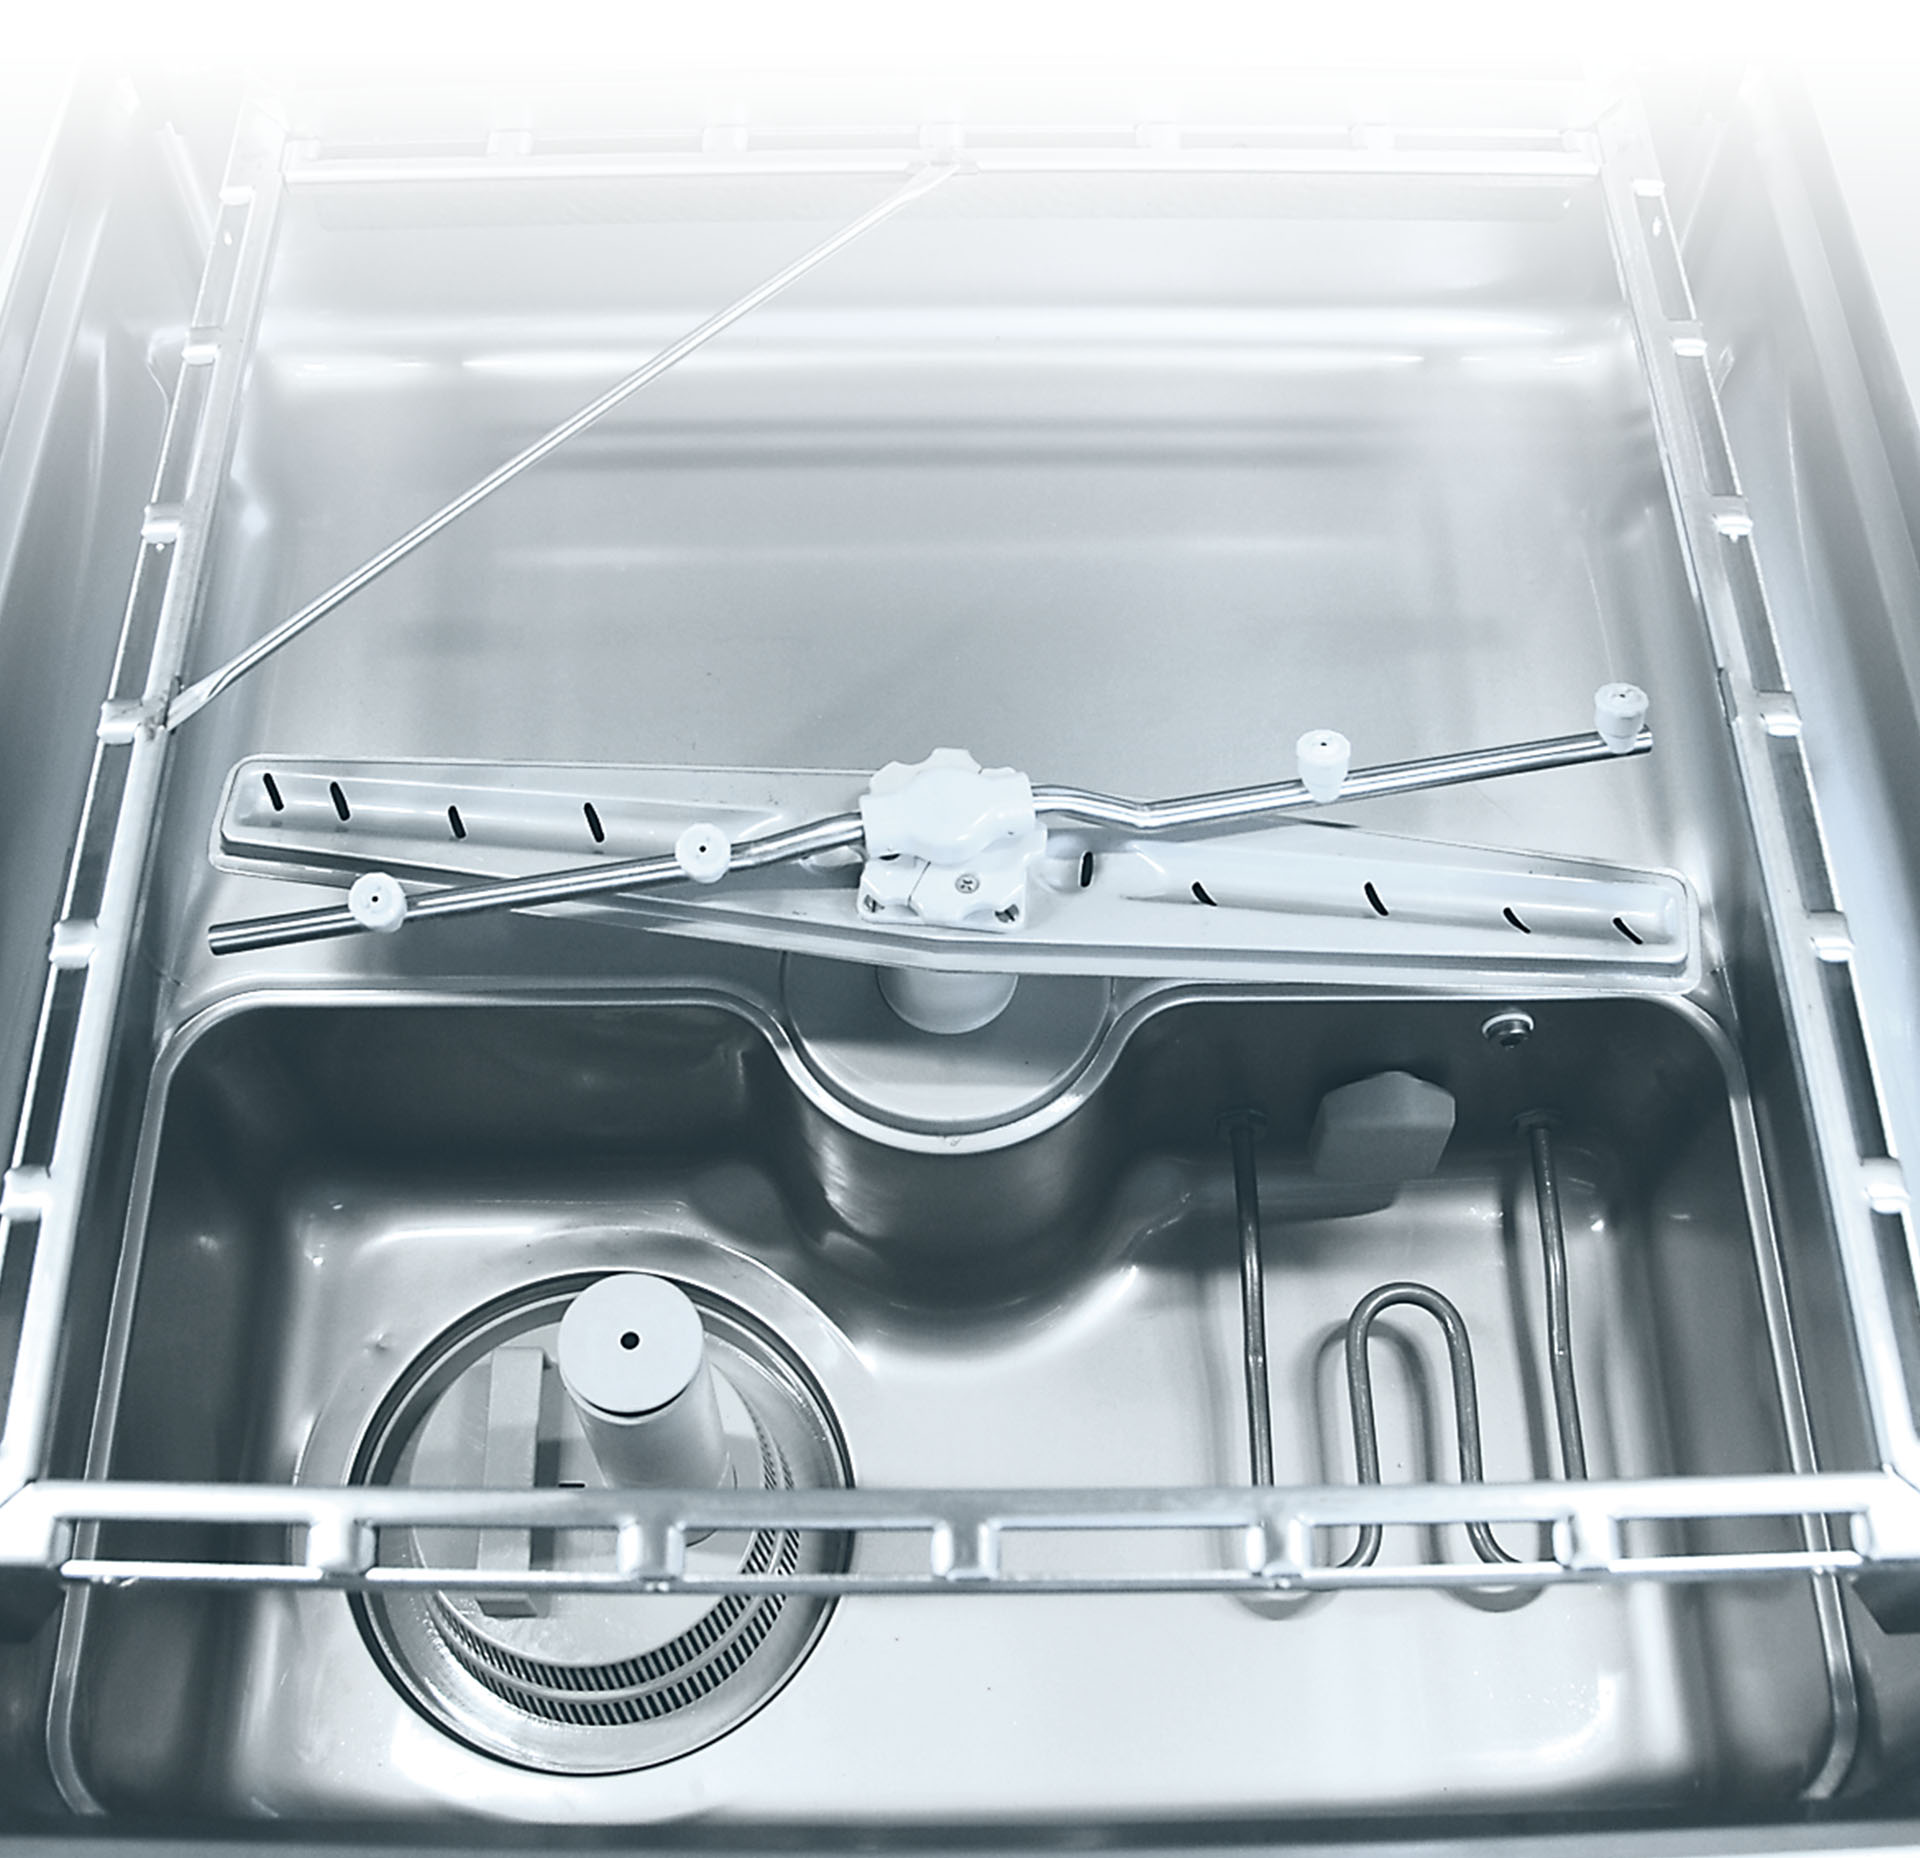 Pass through dishwasher UPster H wash chamber